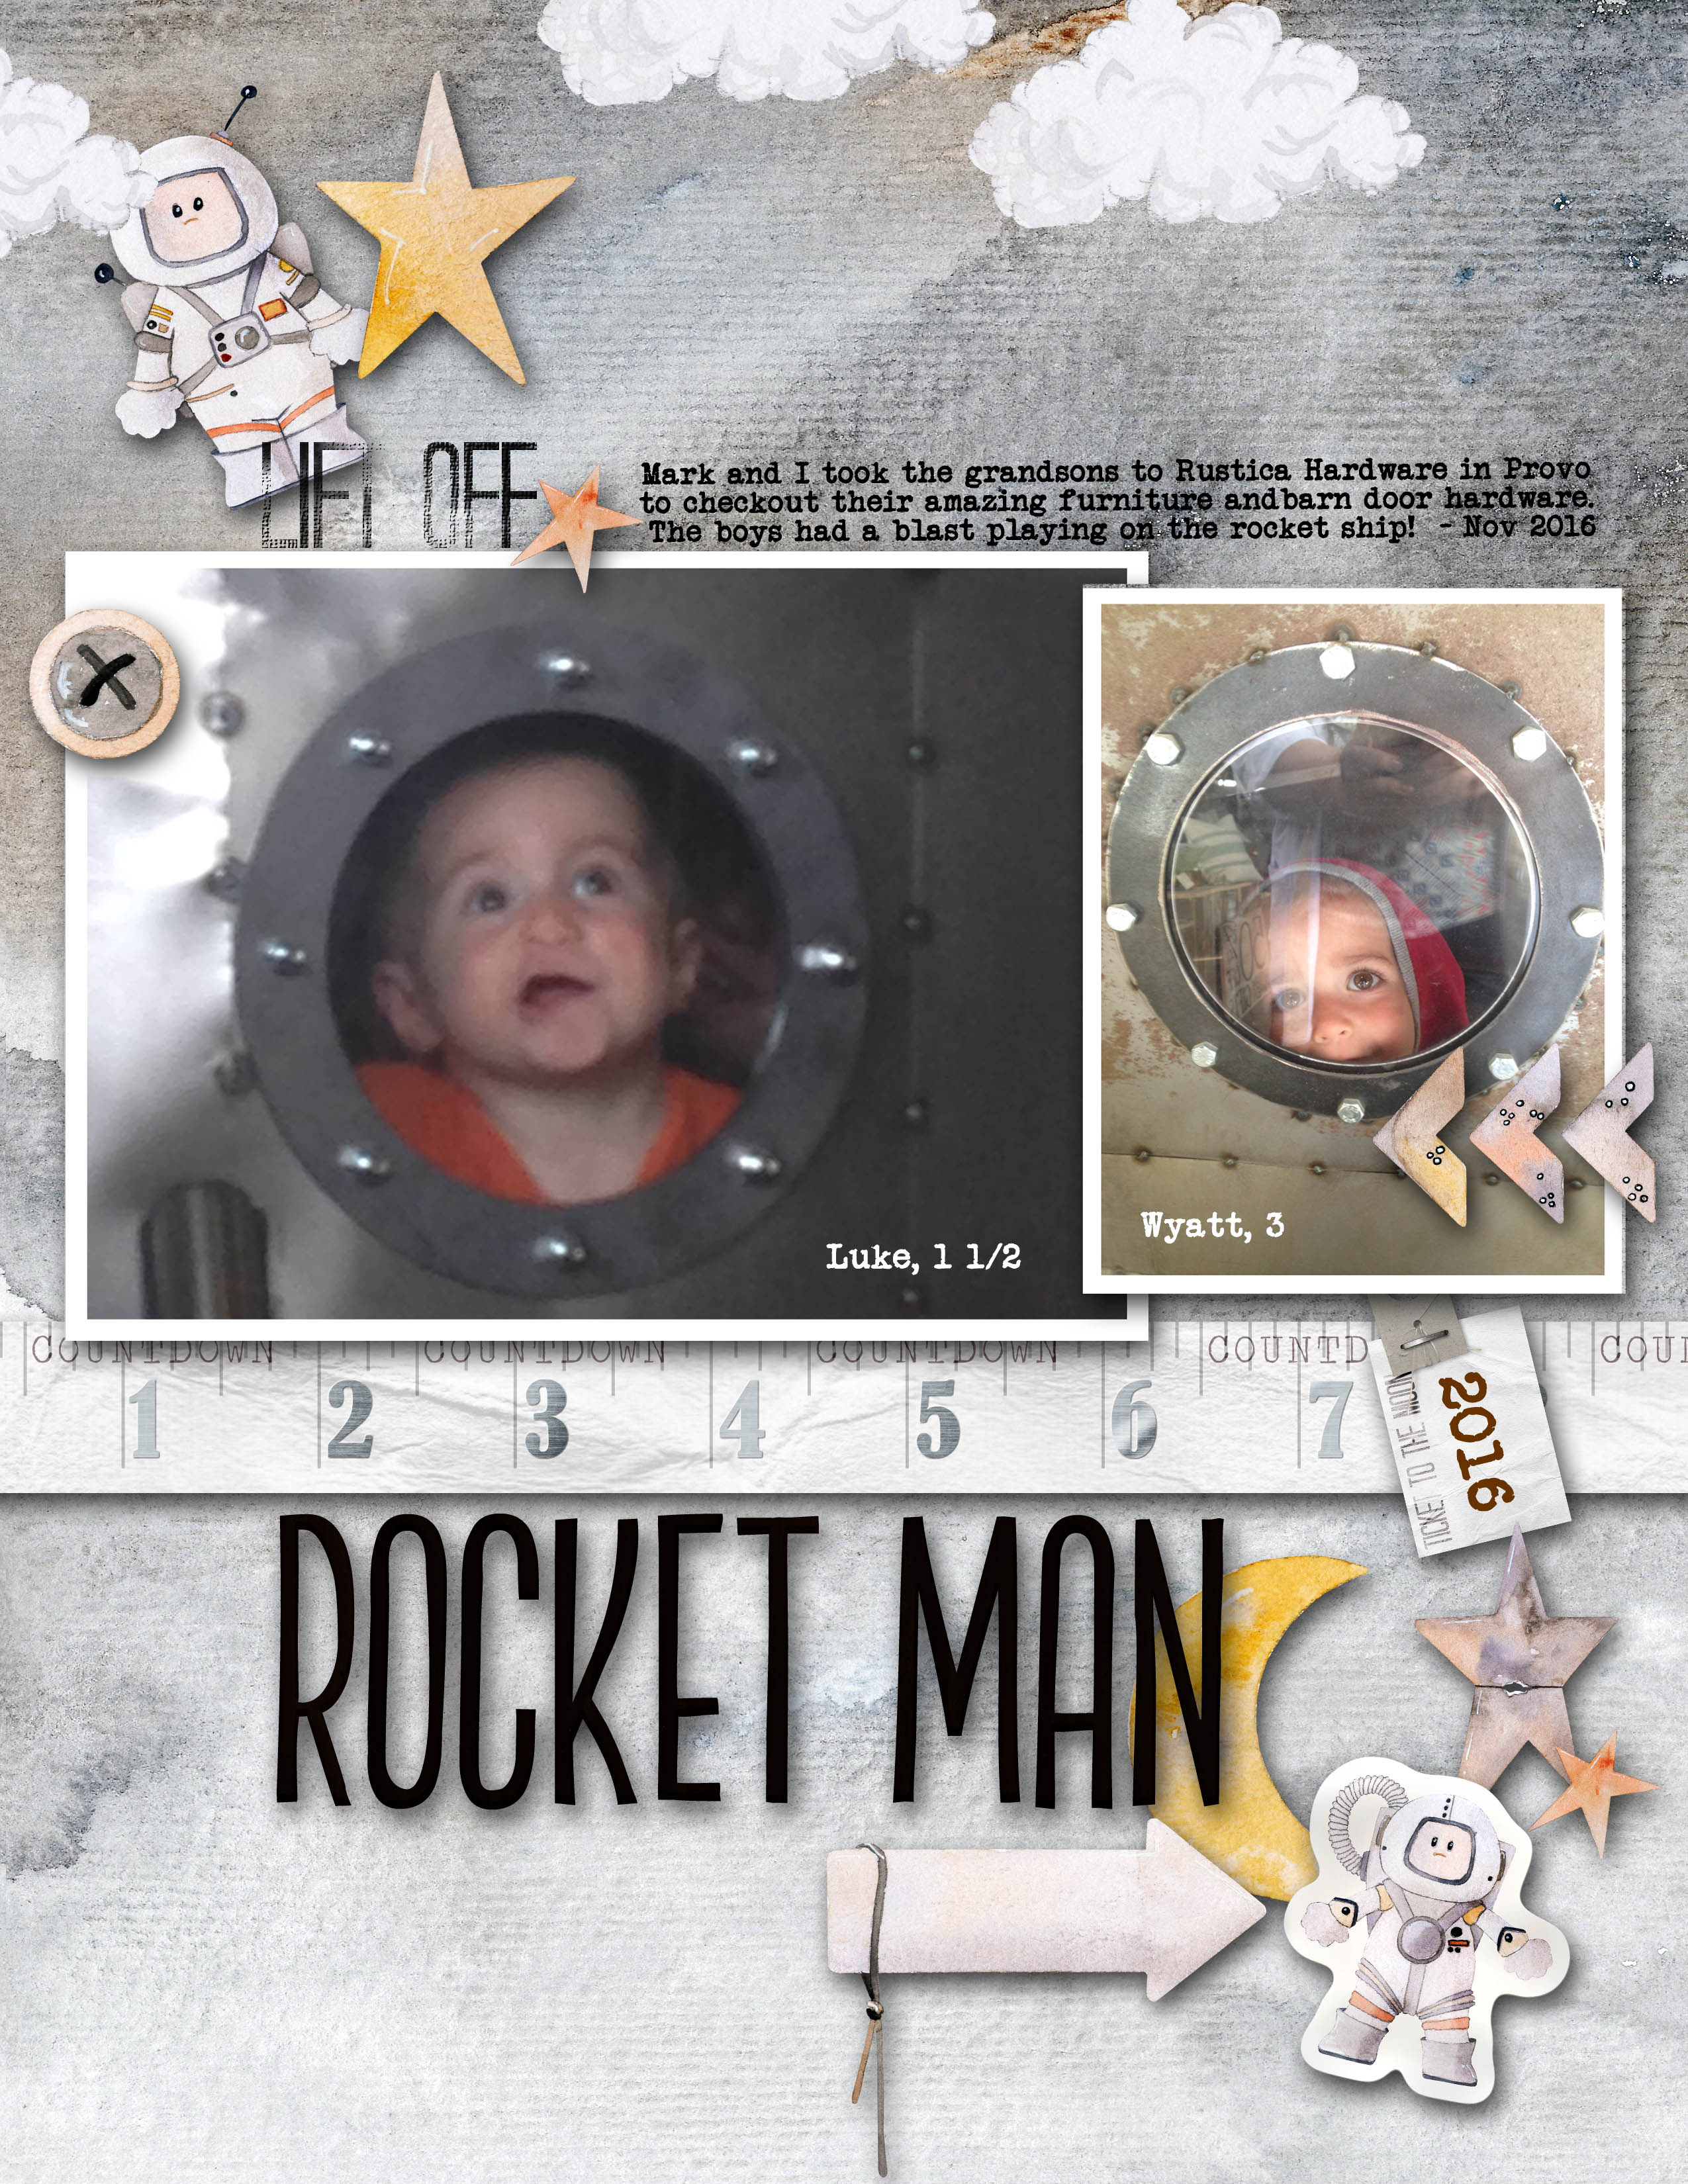 cayton rocket.jpg